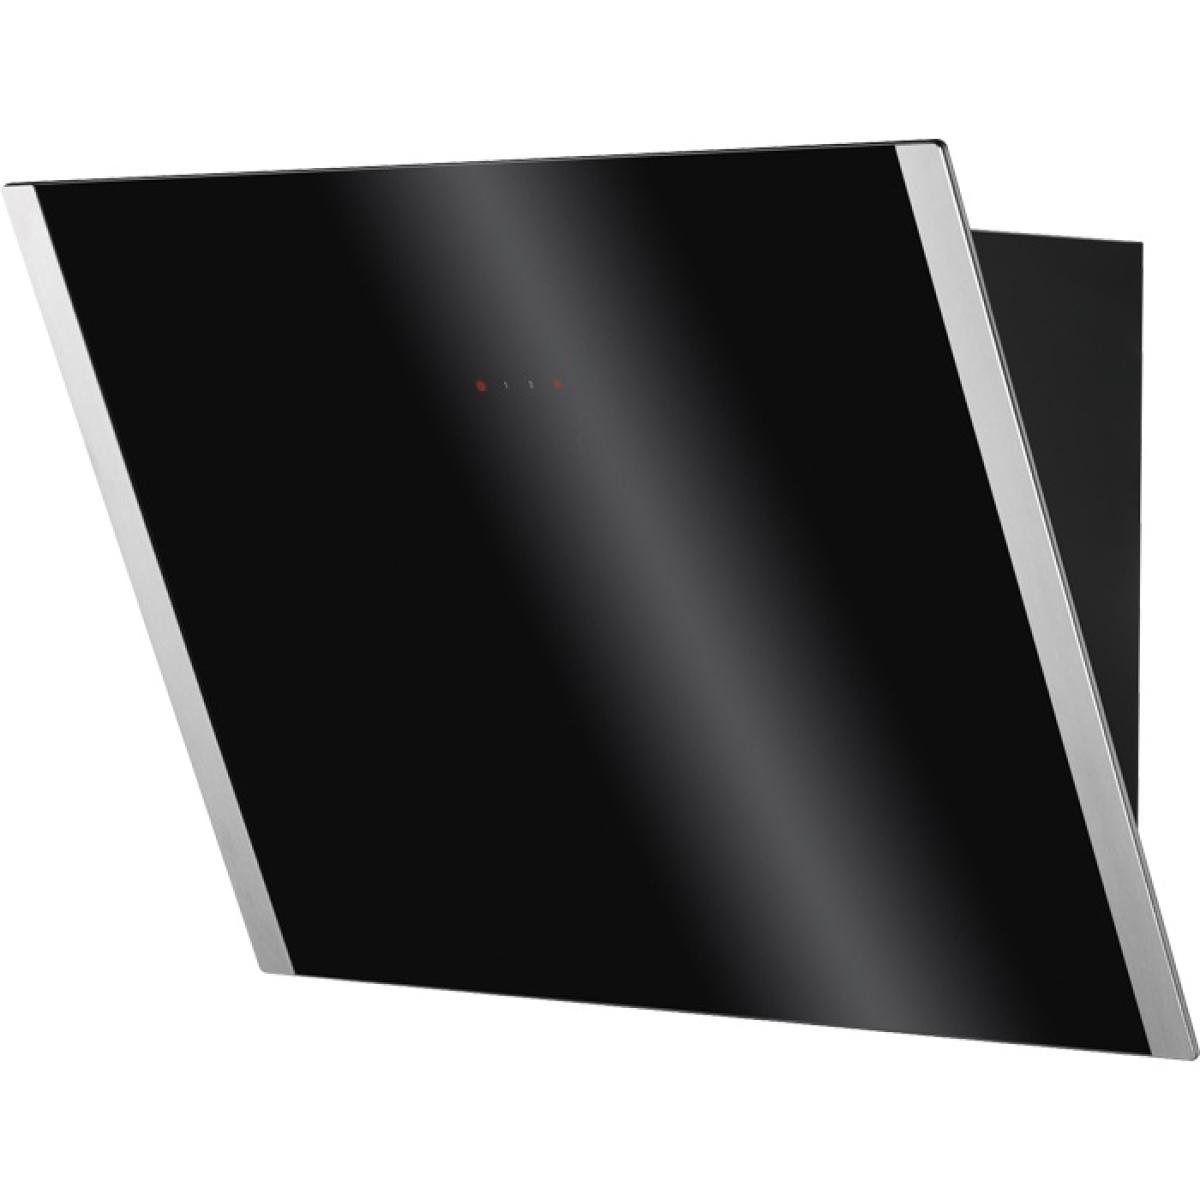 zanussi zhv64750ba kopffreihaube 60 cm g nstig kaufen. Black Bedroom Furniture Sets. Home Design Ideas